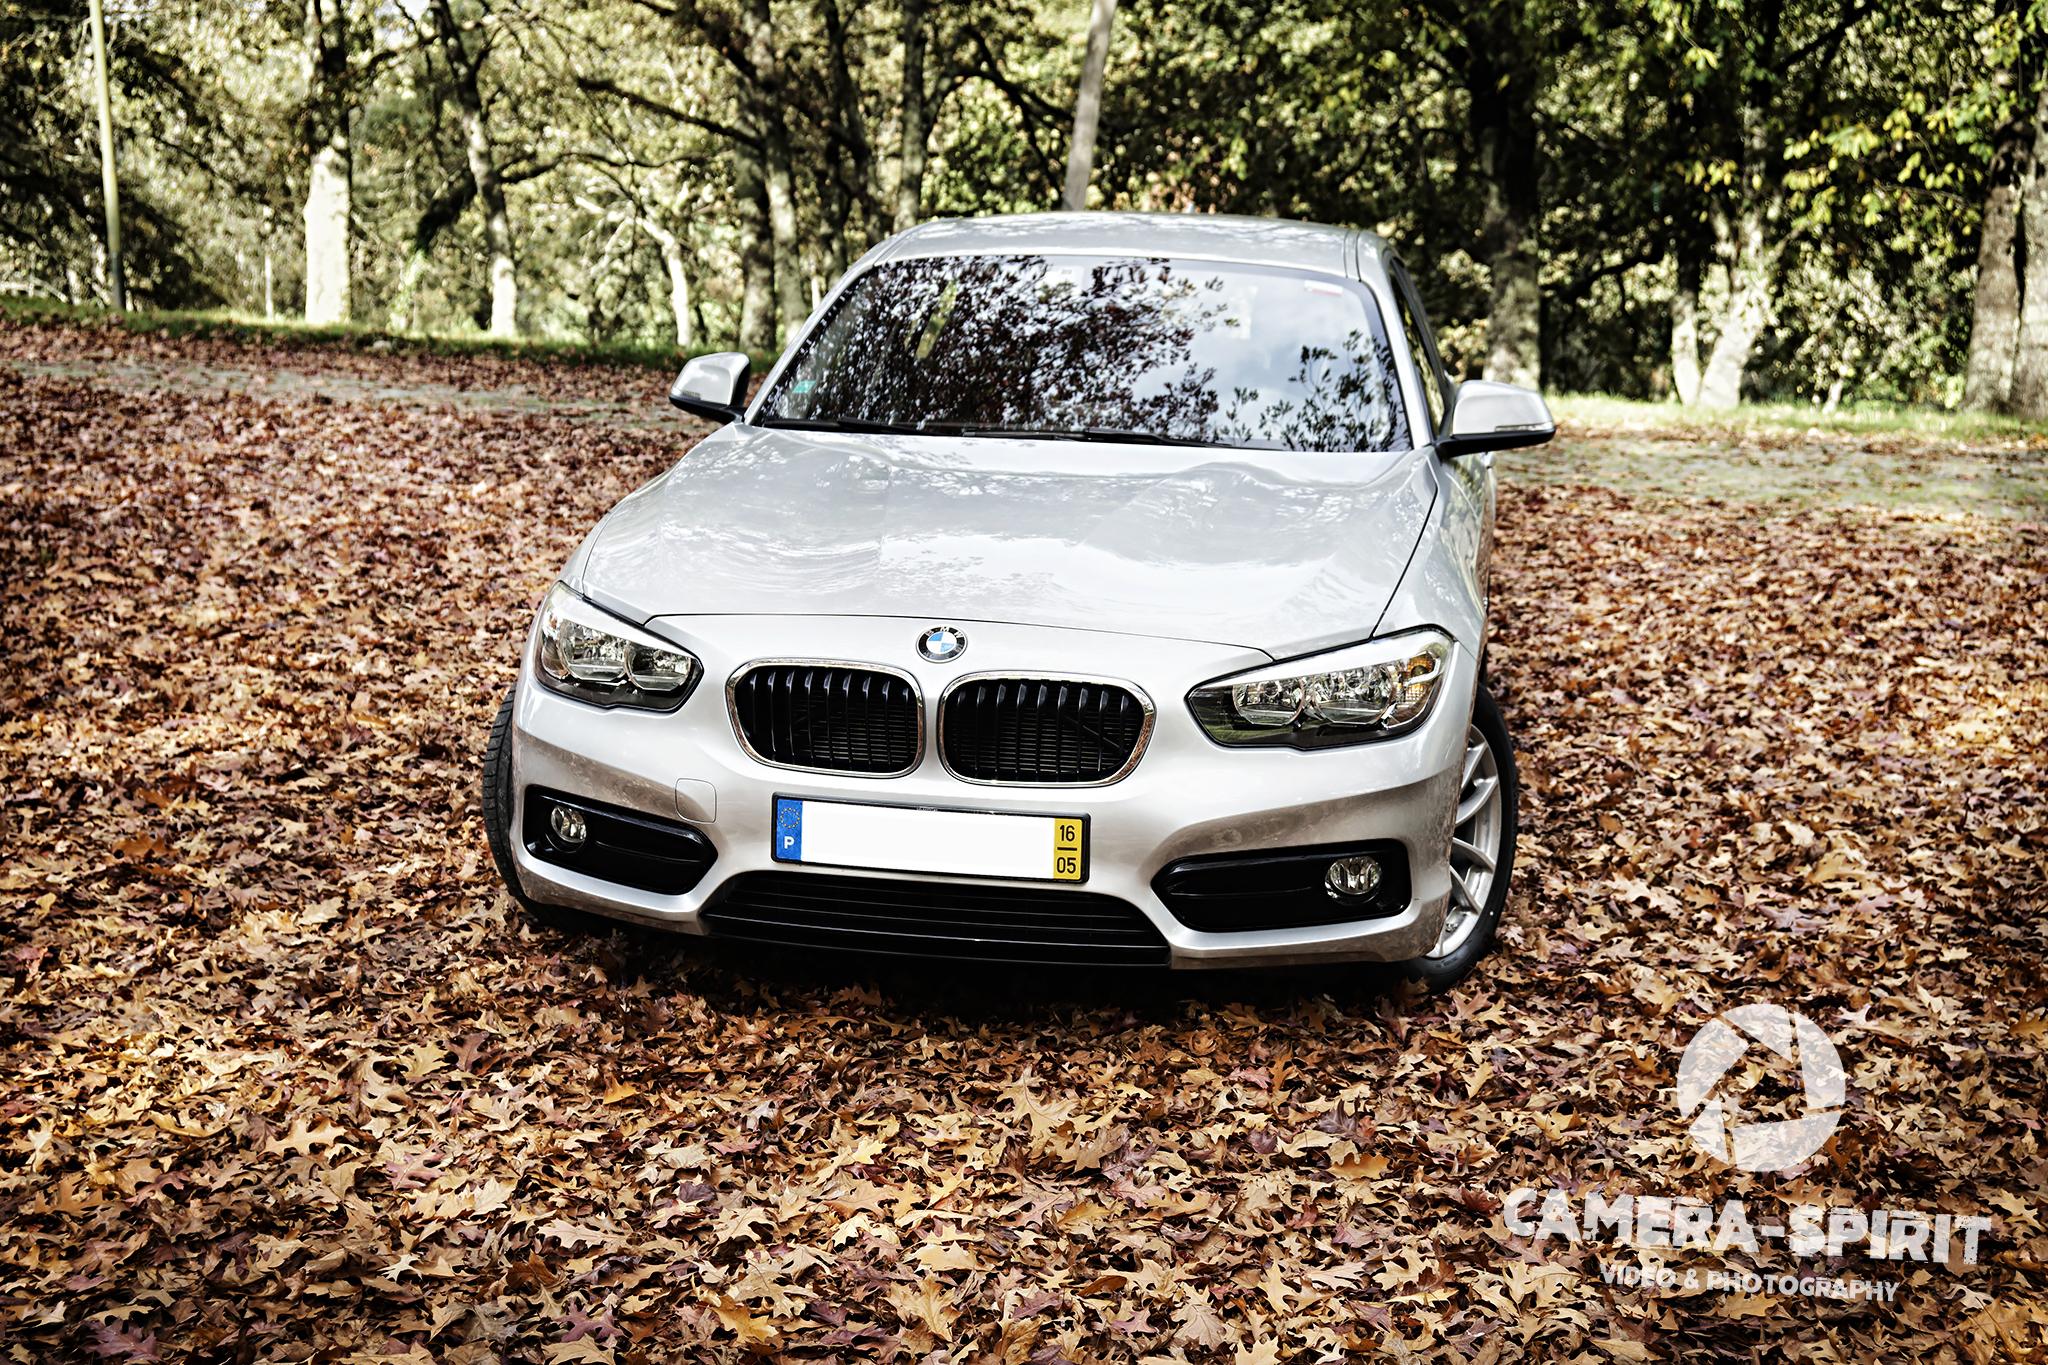 BMW_StandAutoLux_08_PL